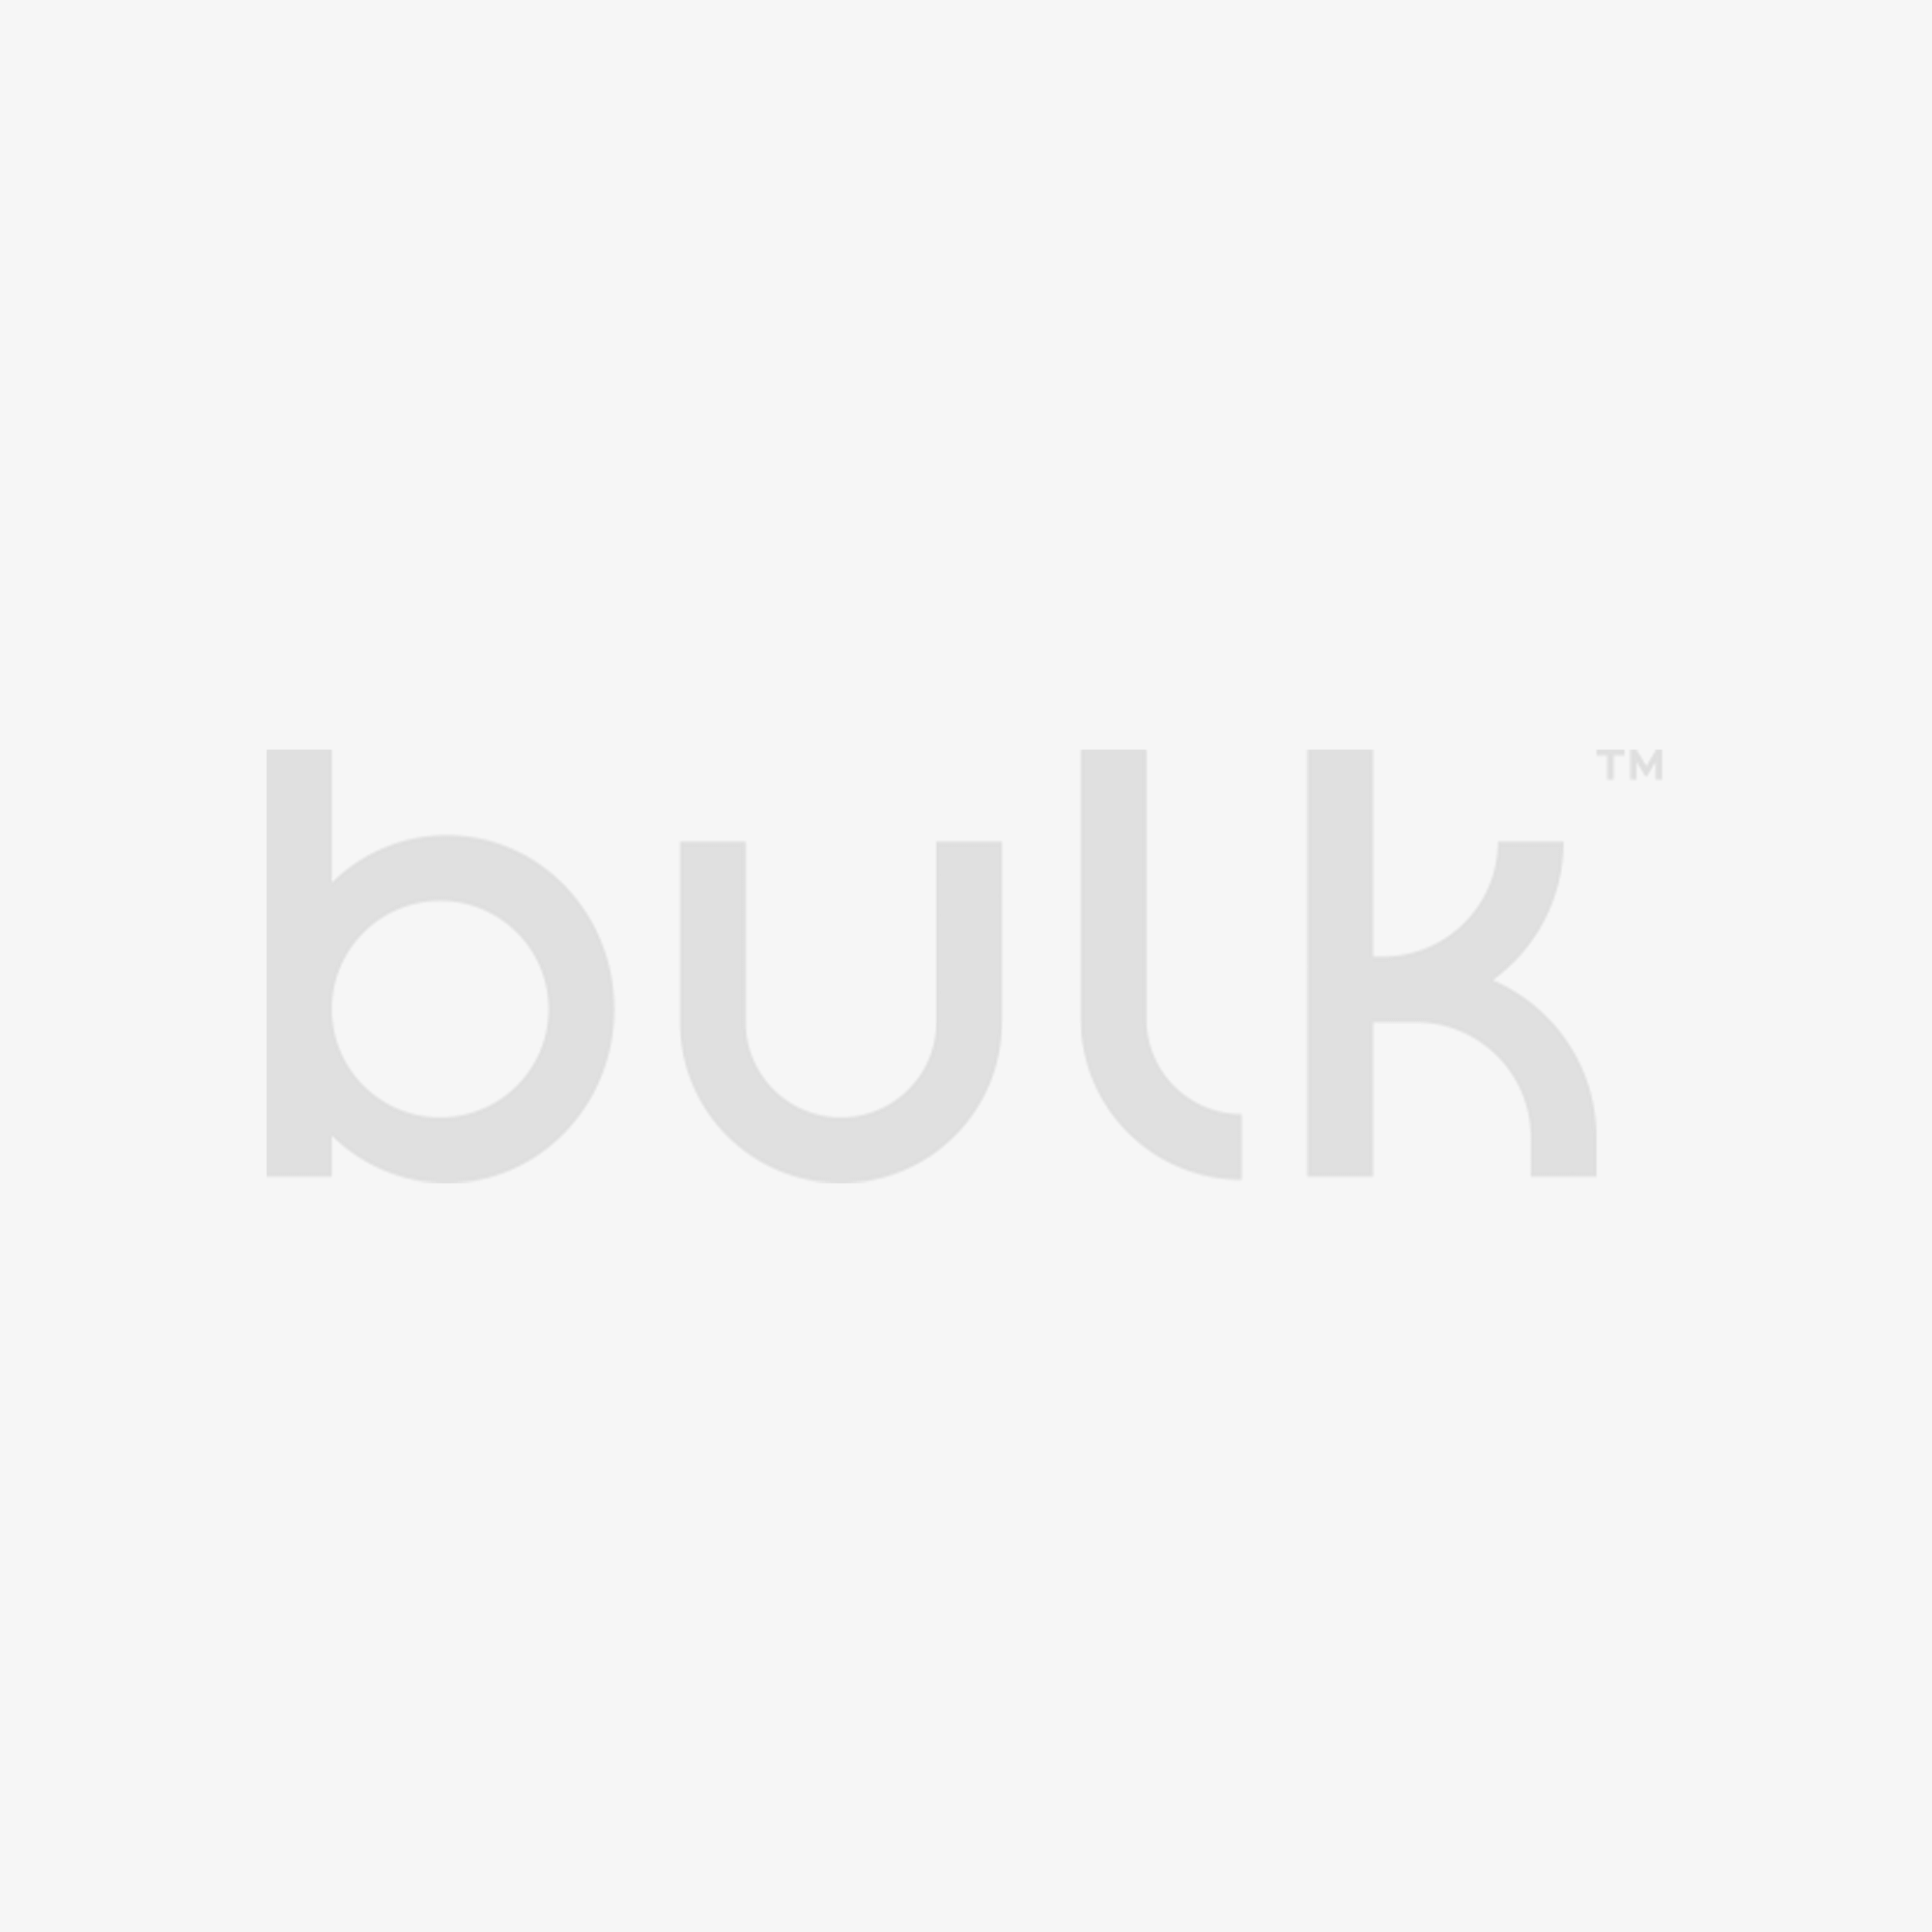 Chaleco de alto rendimiento BULK POWDERS™